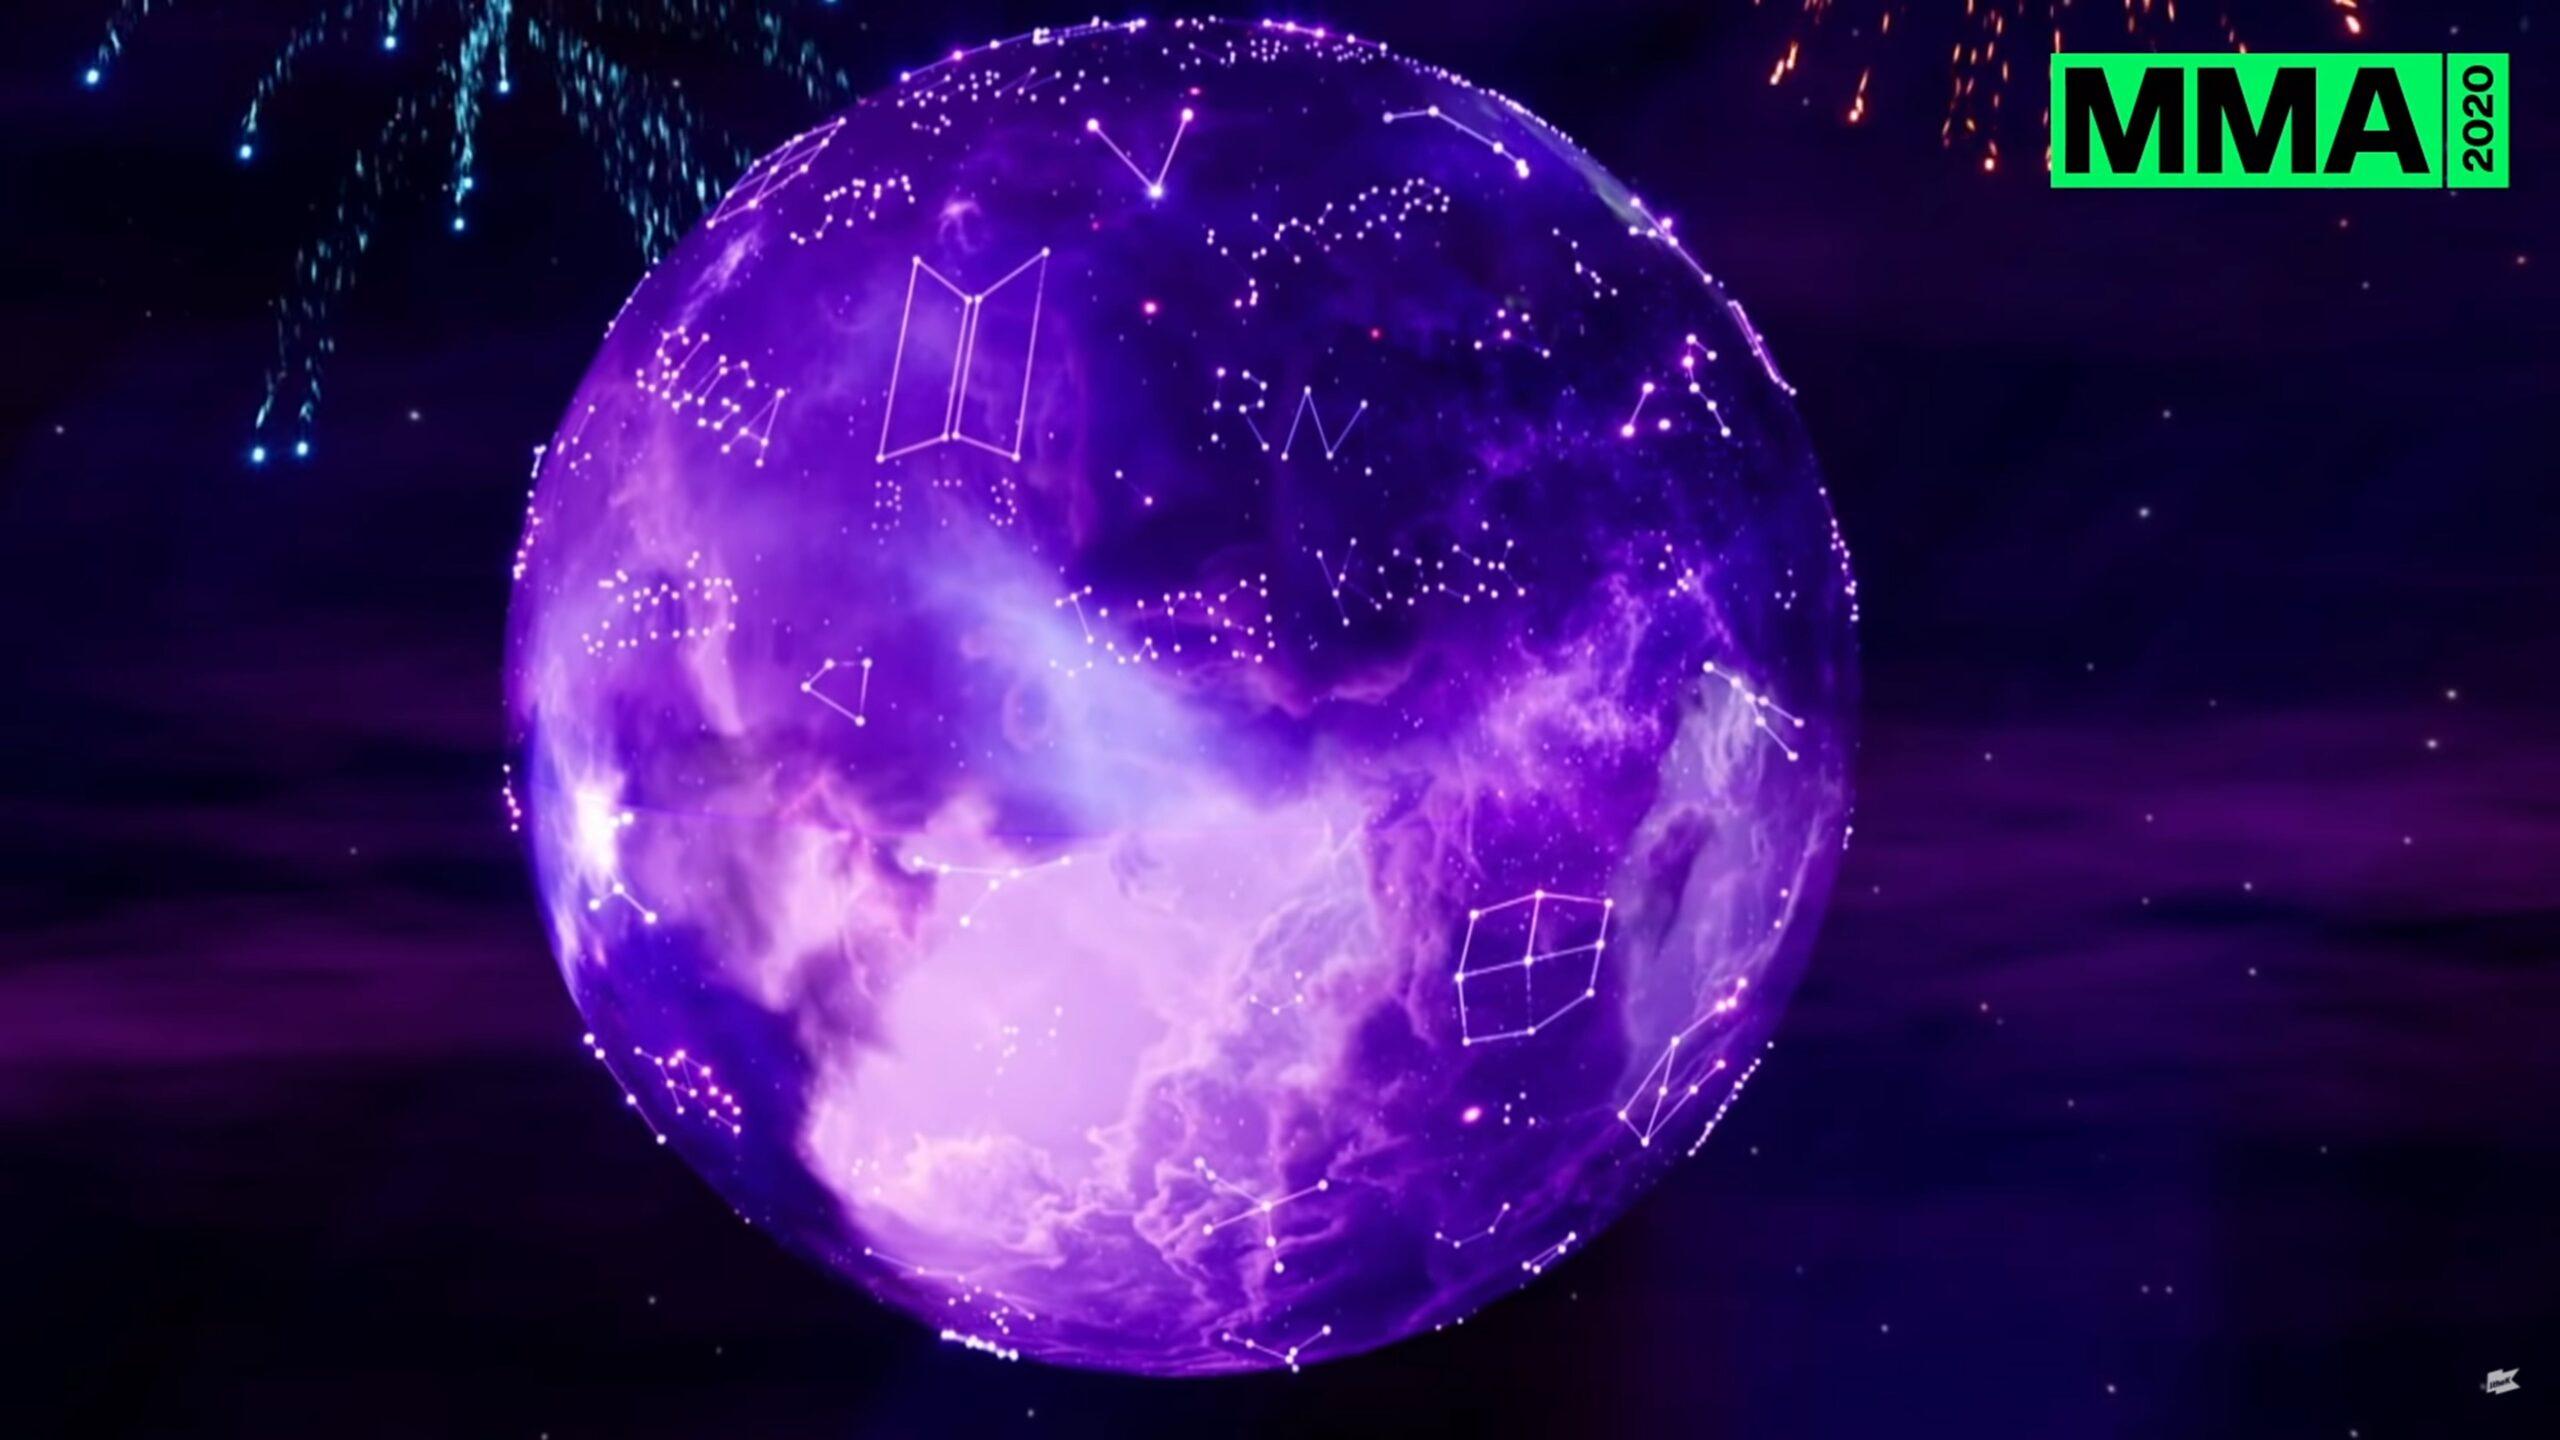 Purple constellations circle a globe